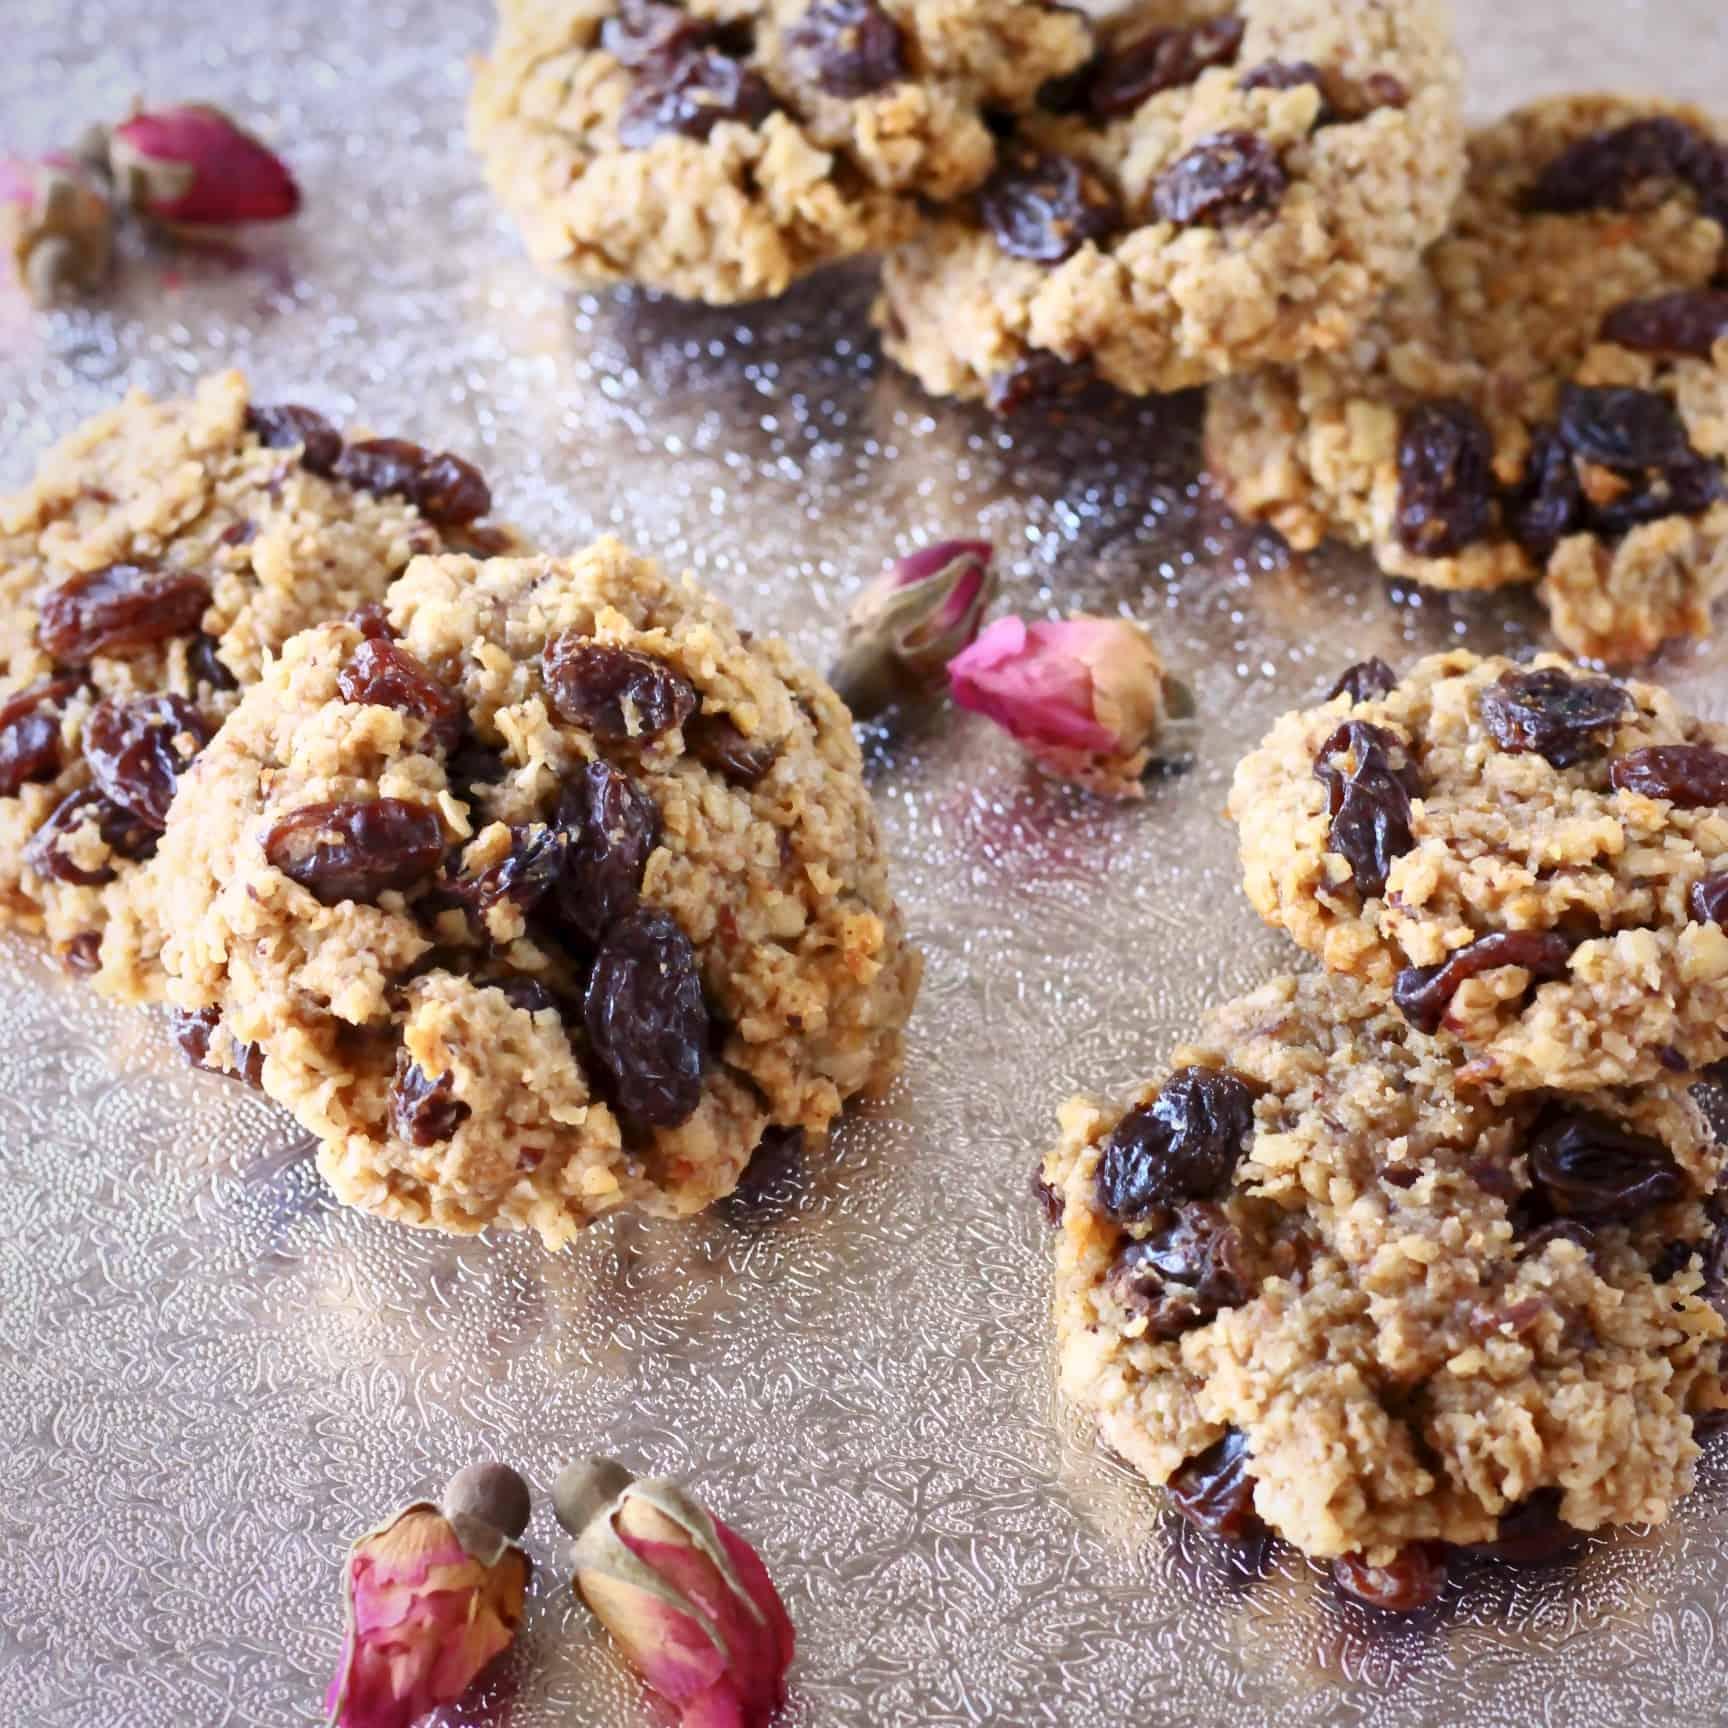 Gluten-Free Vegan Oatmeal Raisin Cookies